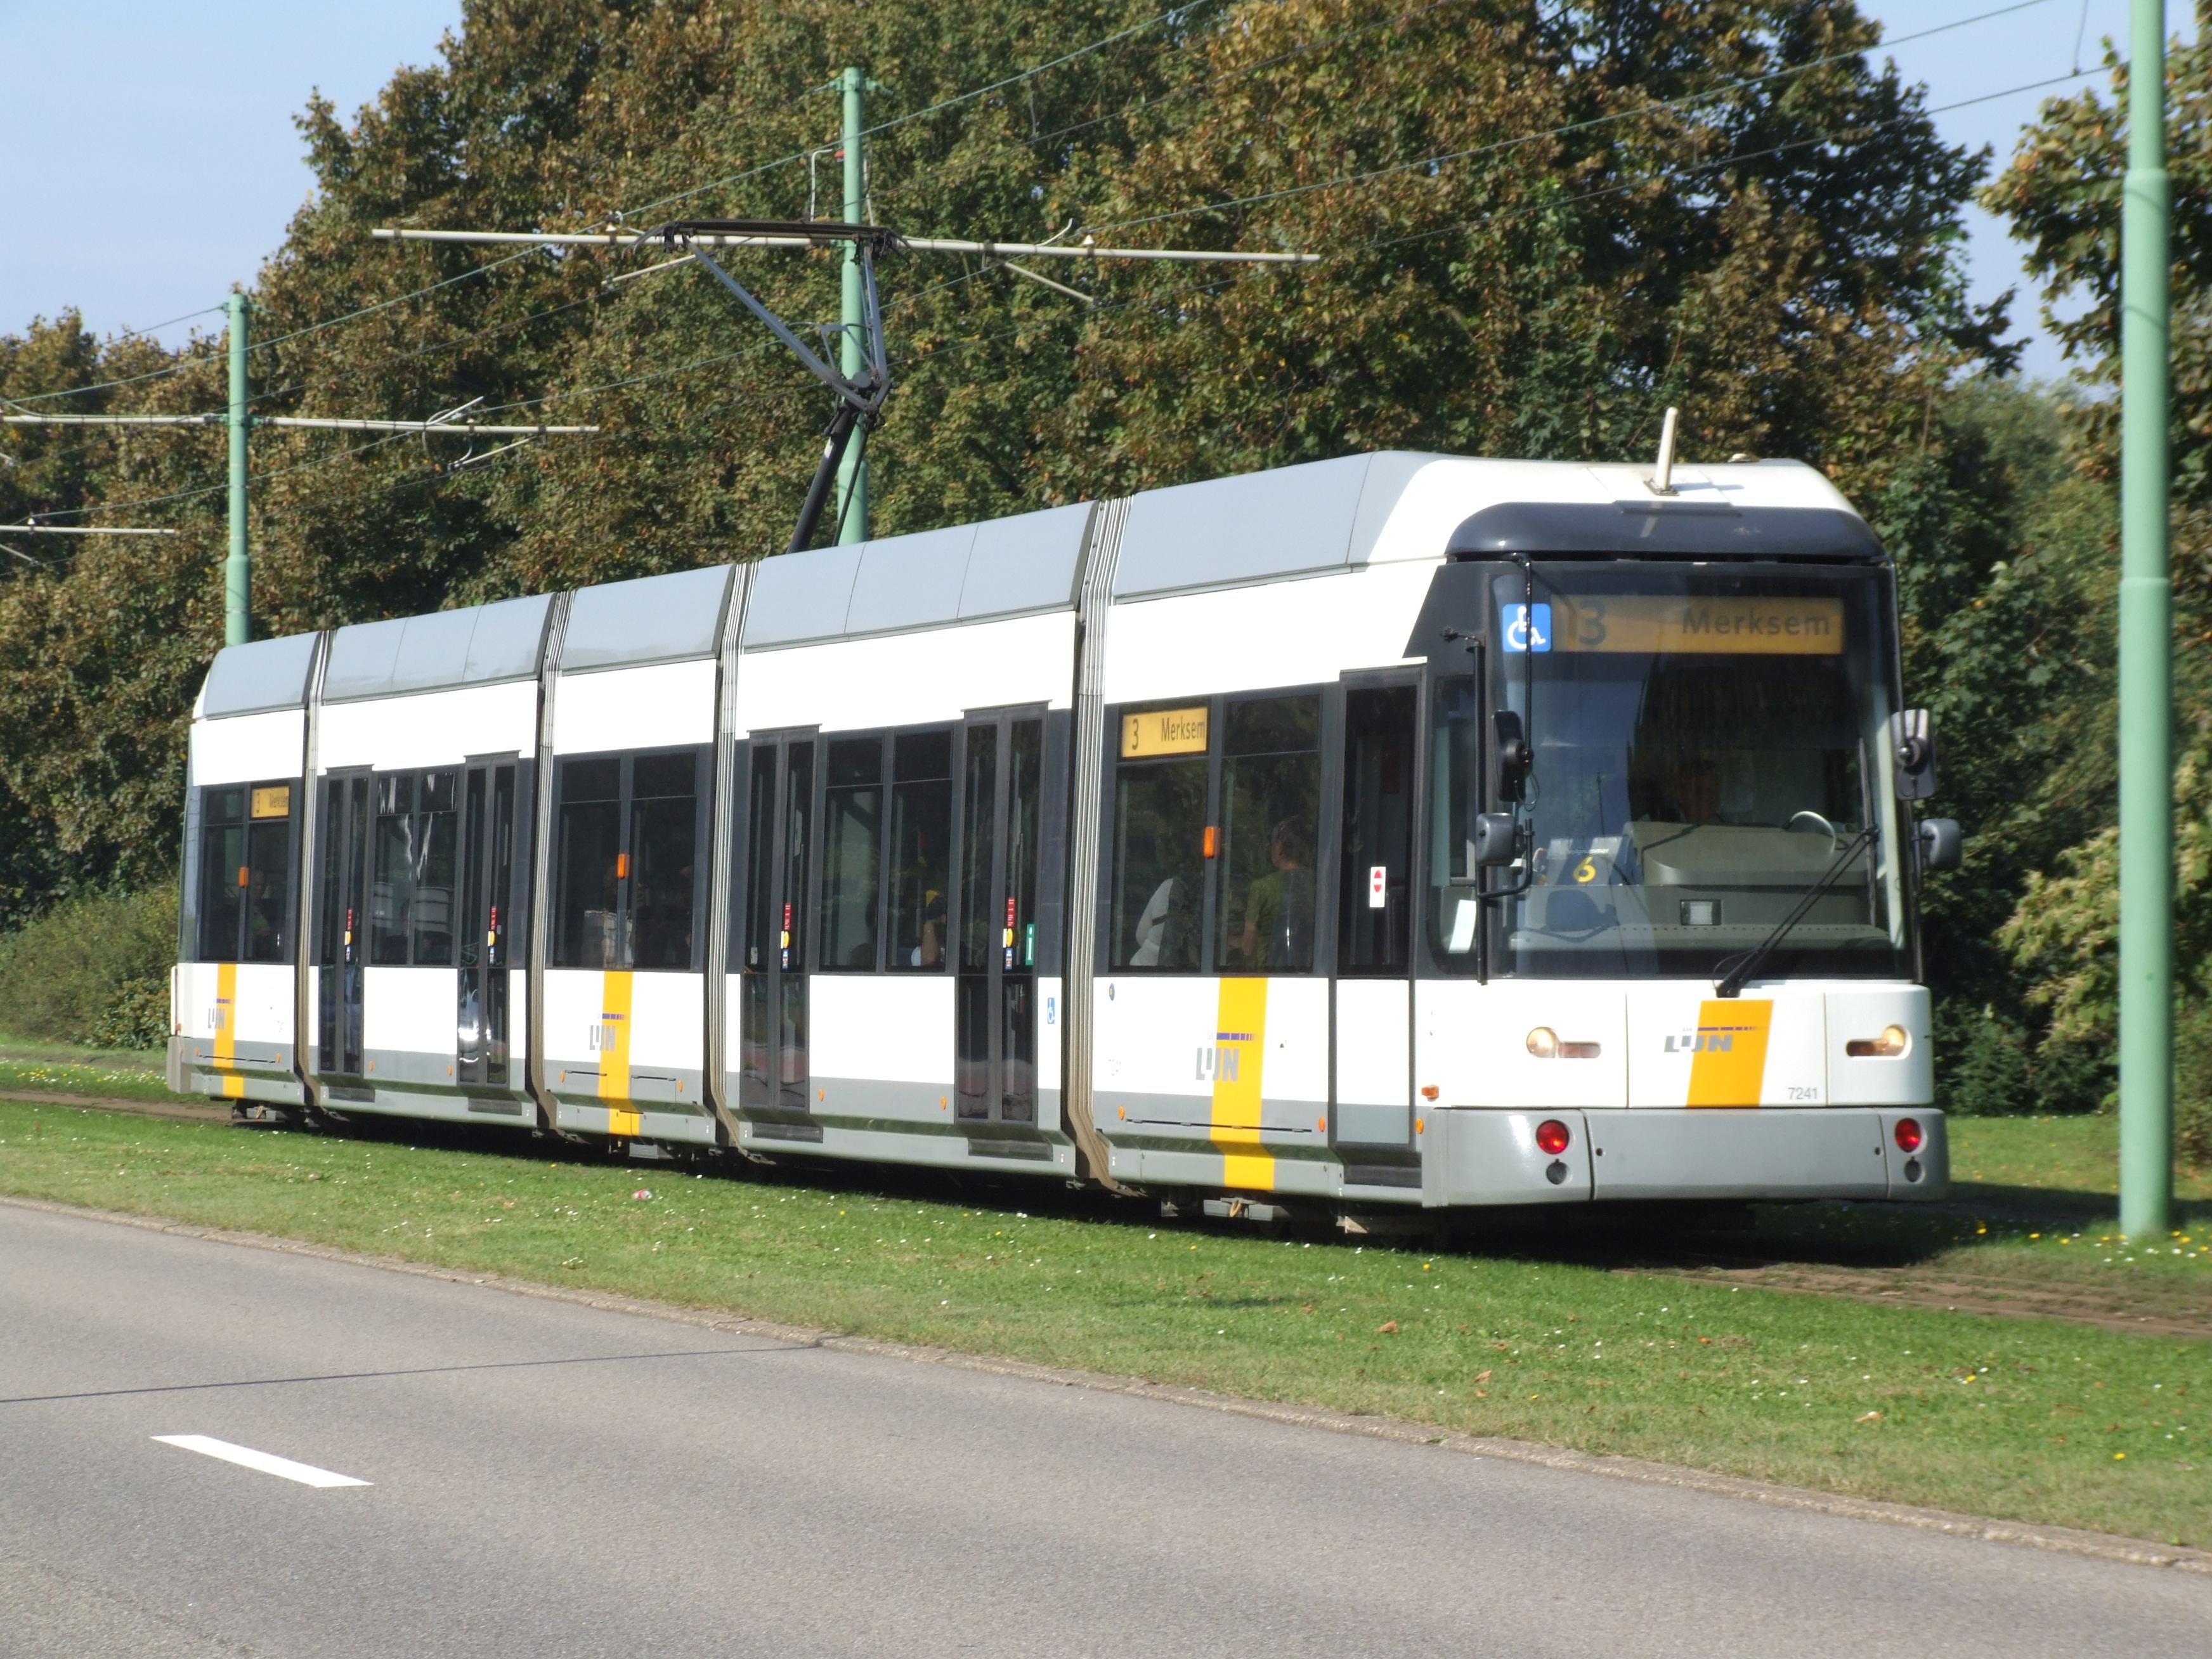 Tram Car Accident Wildwood Nj